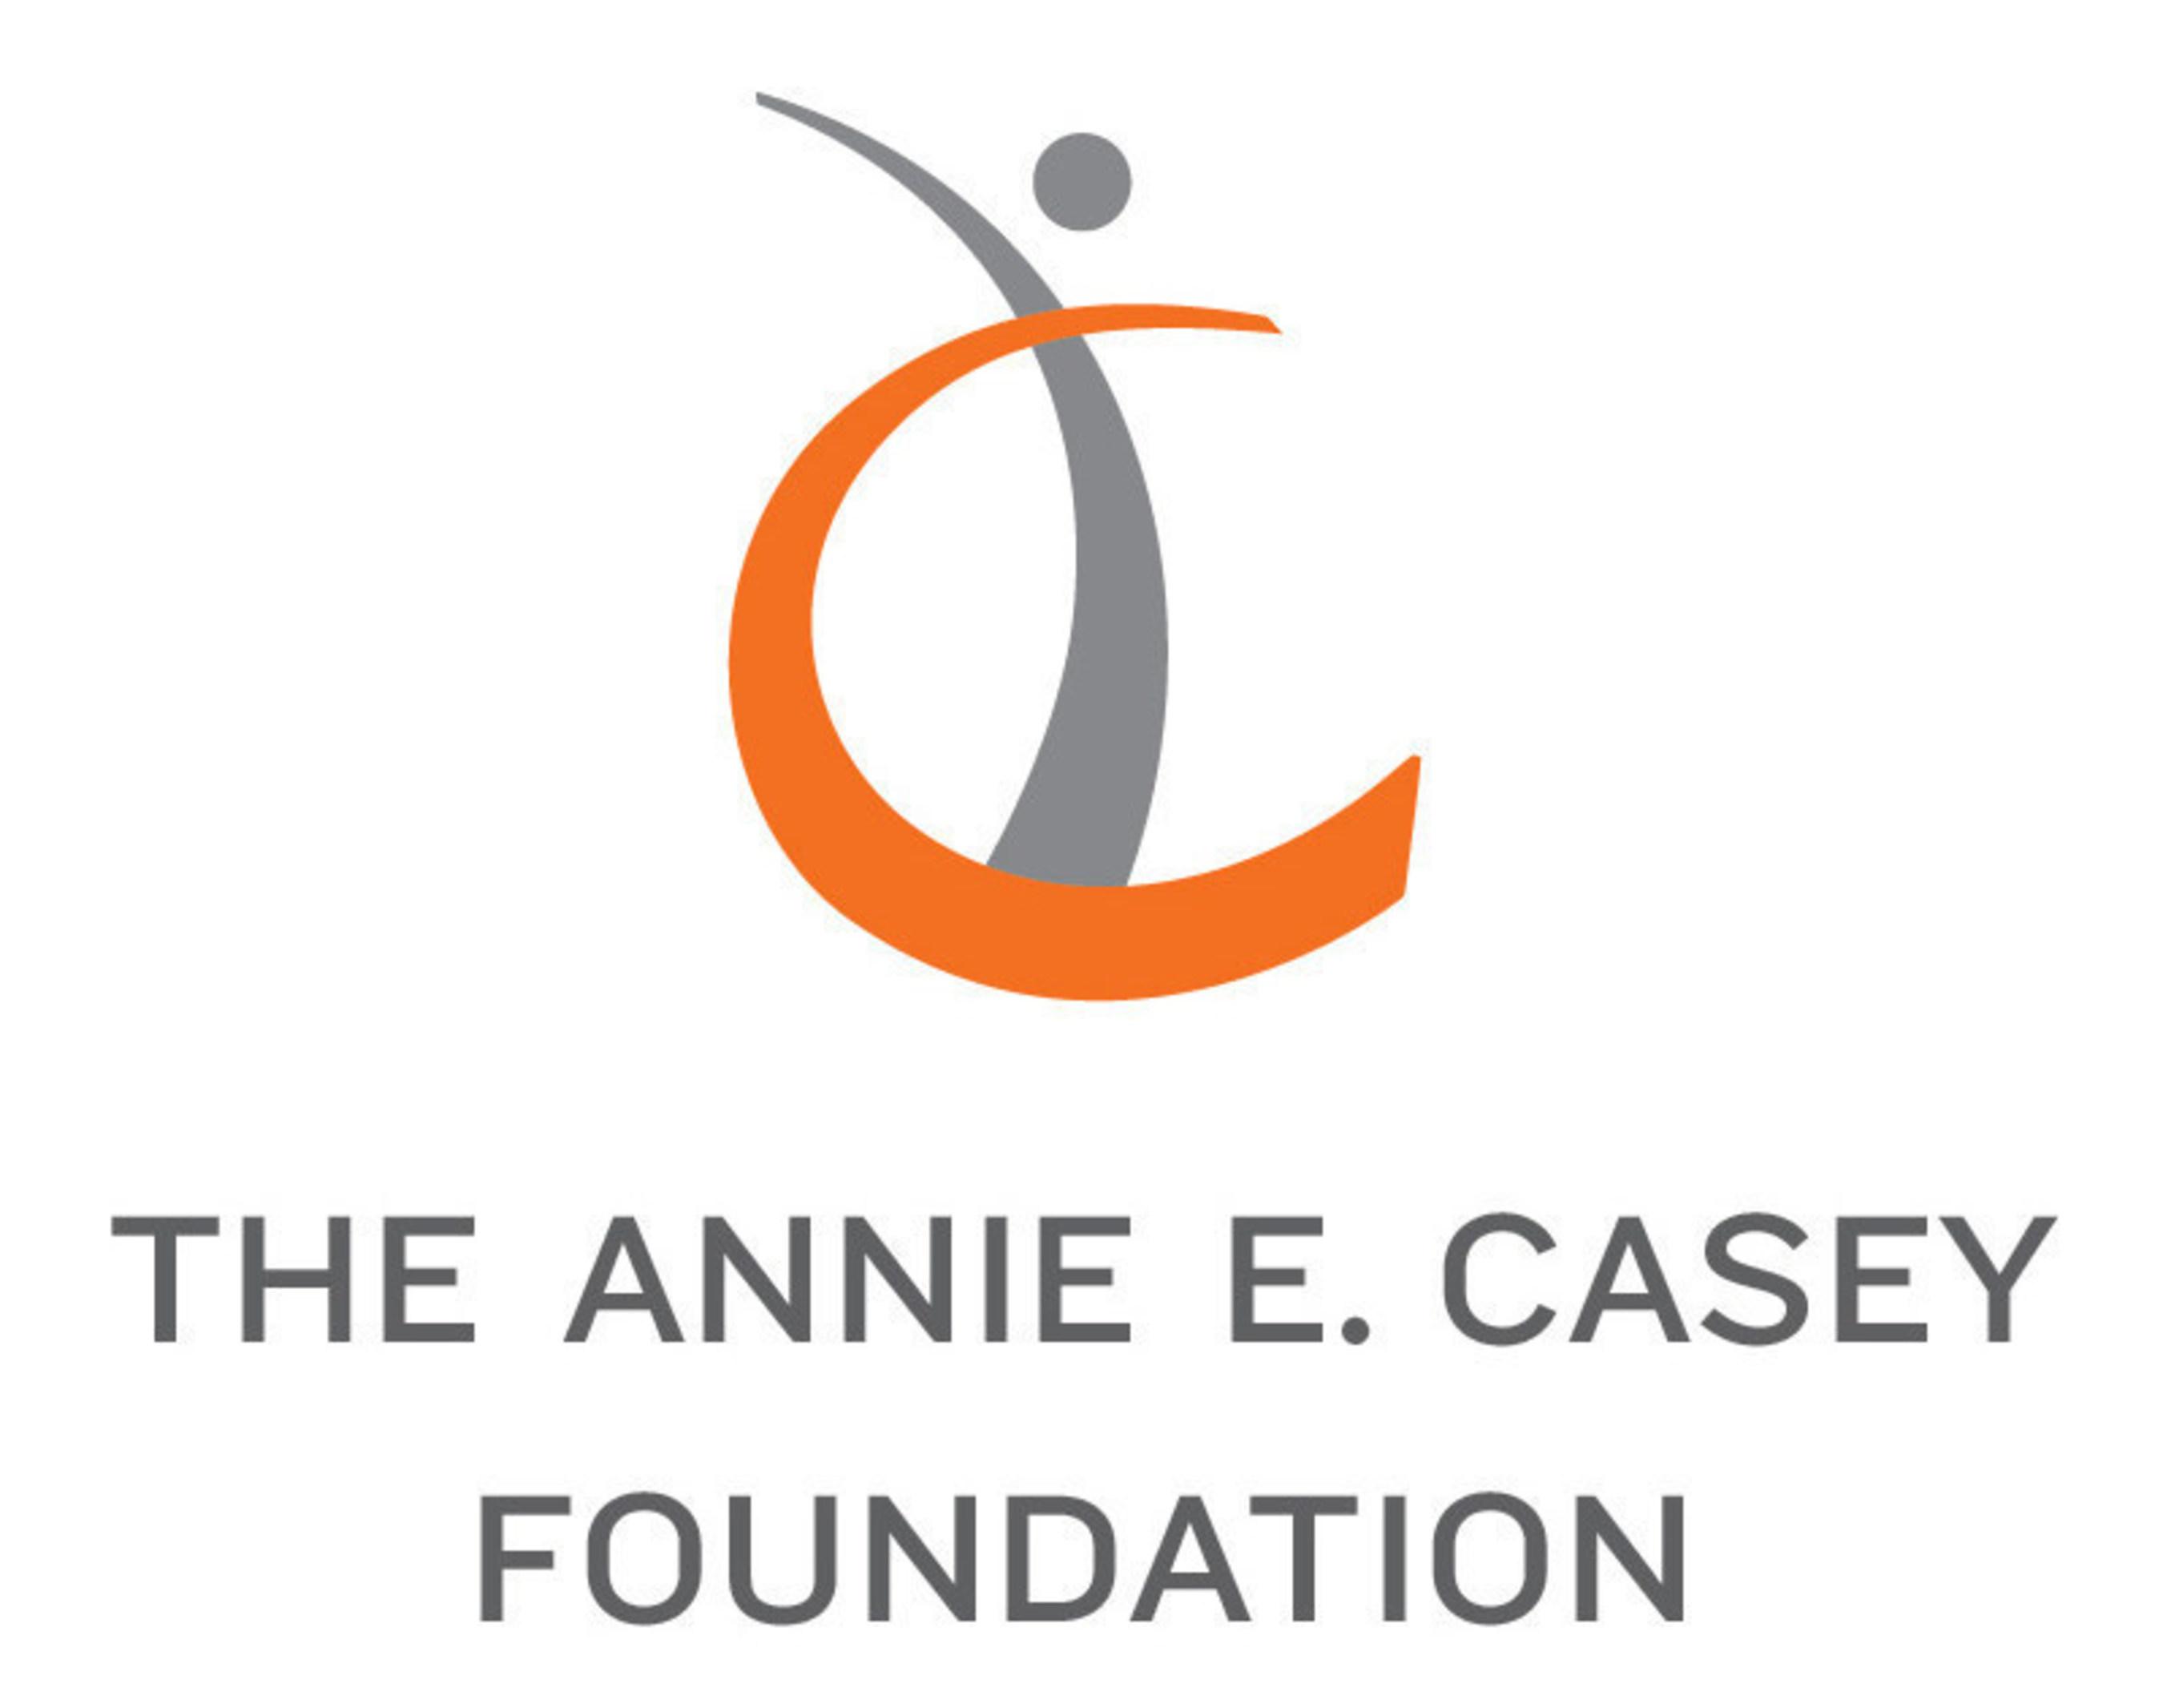 Annie E. Casey's logo